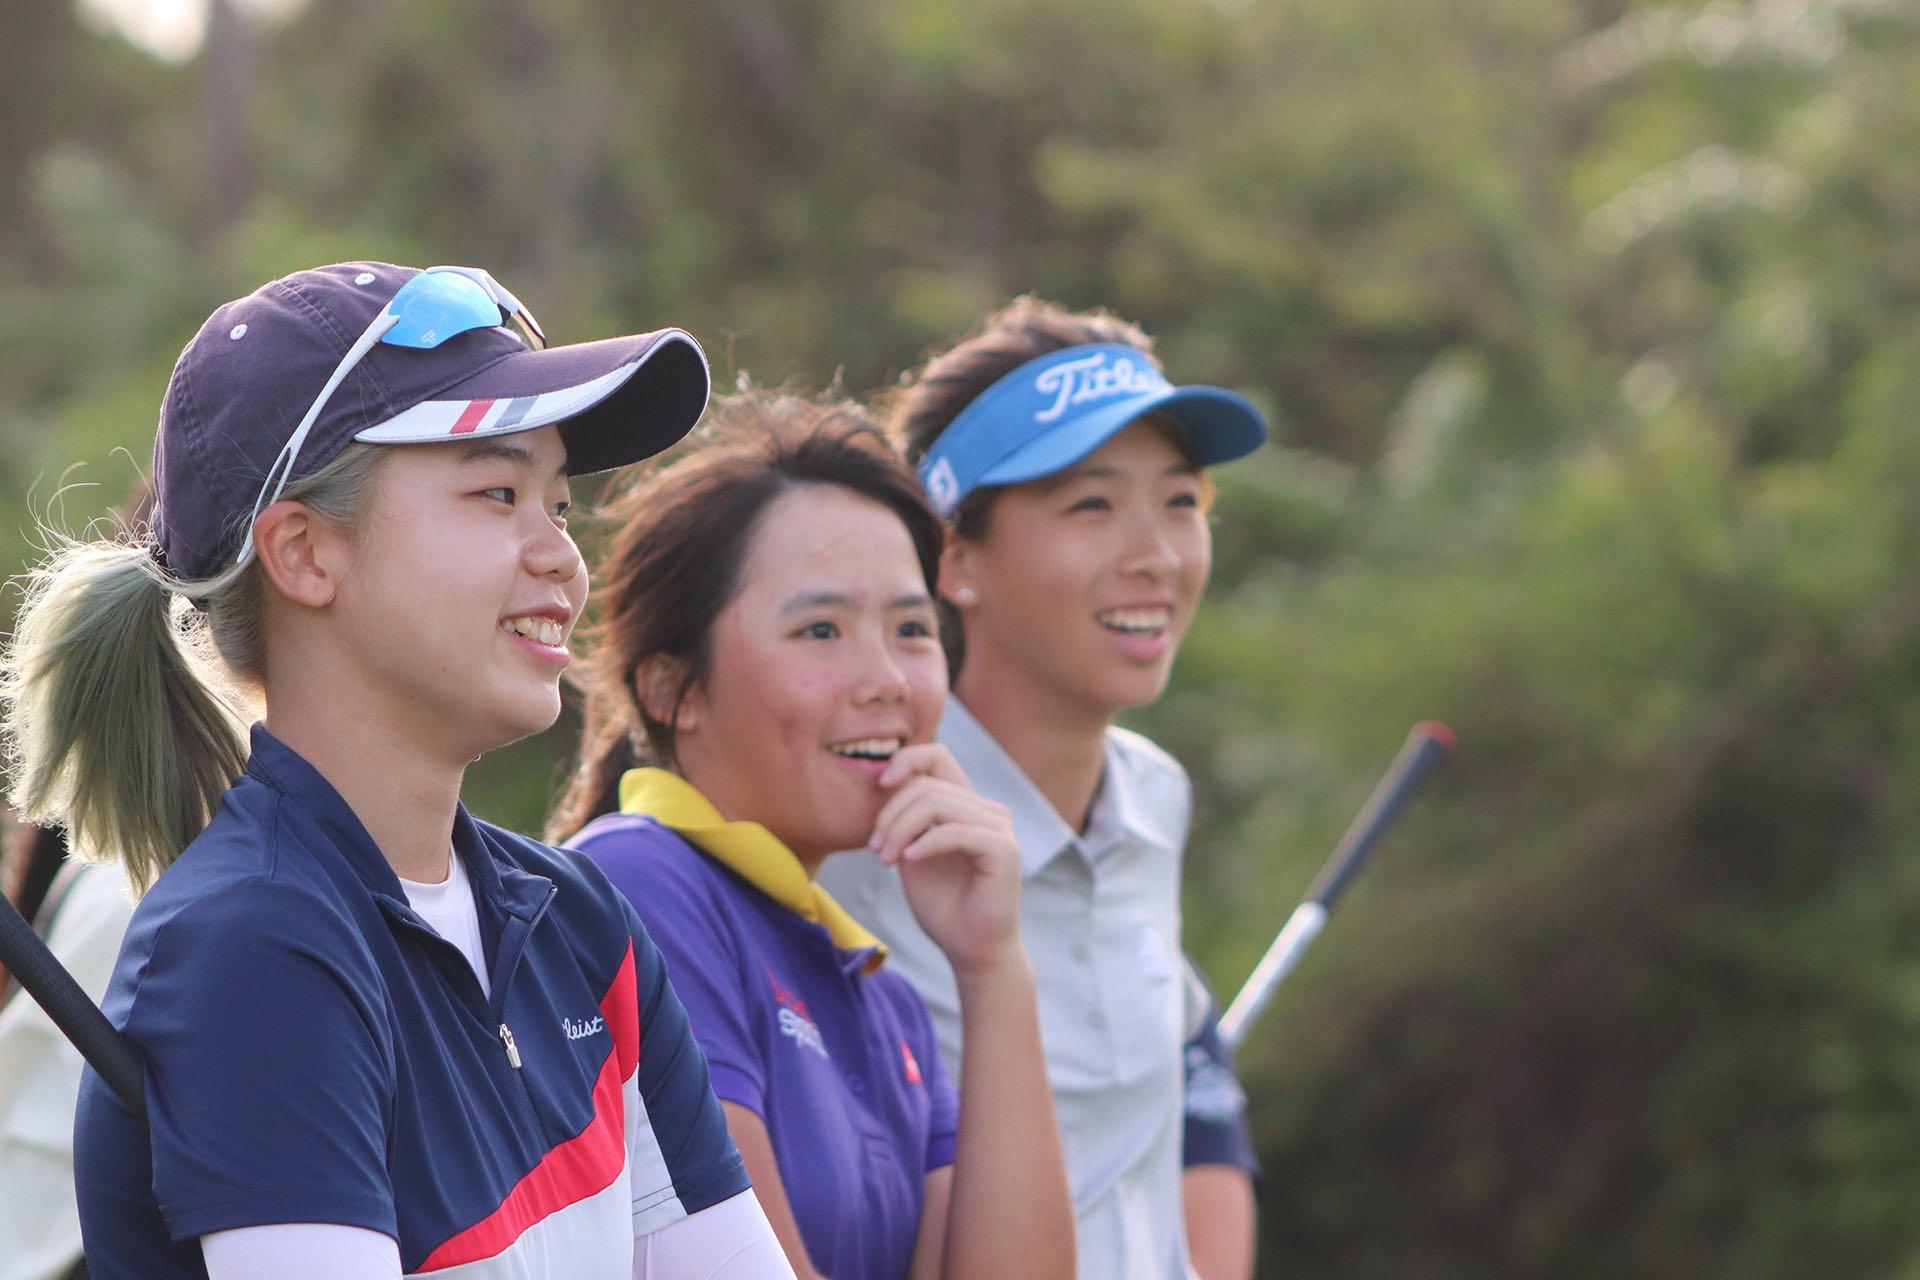 Jenny Chang, Hoi Ki Lau, and Charlene Chung at the Junior Aspirations at The Bluffs